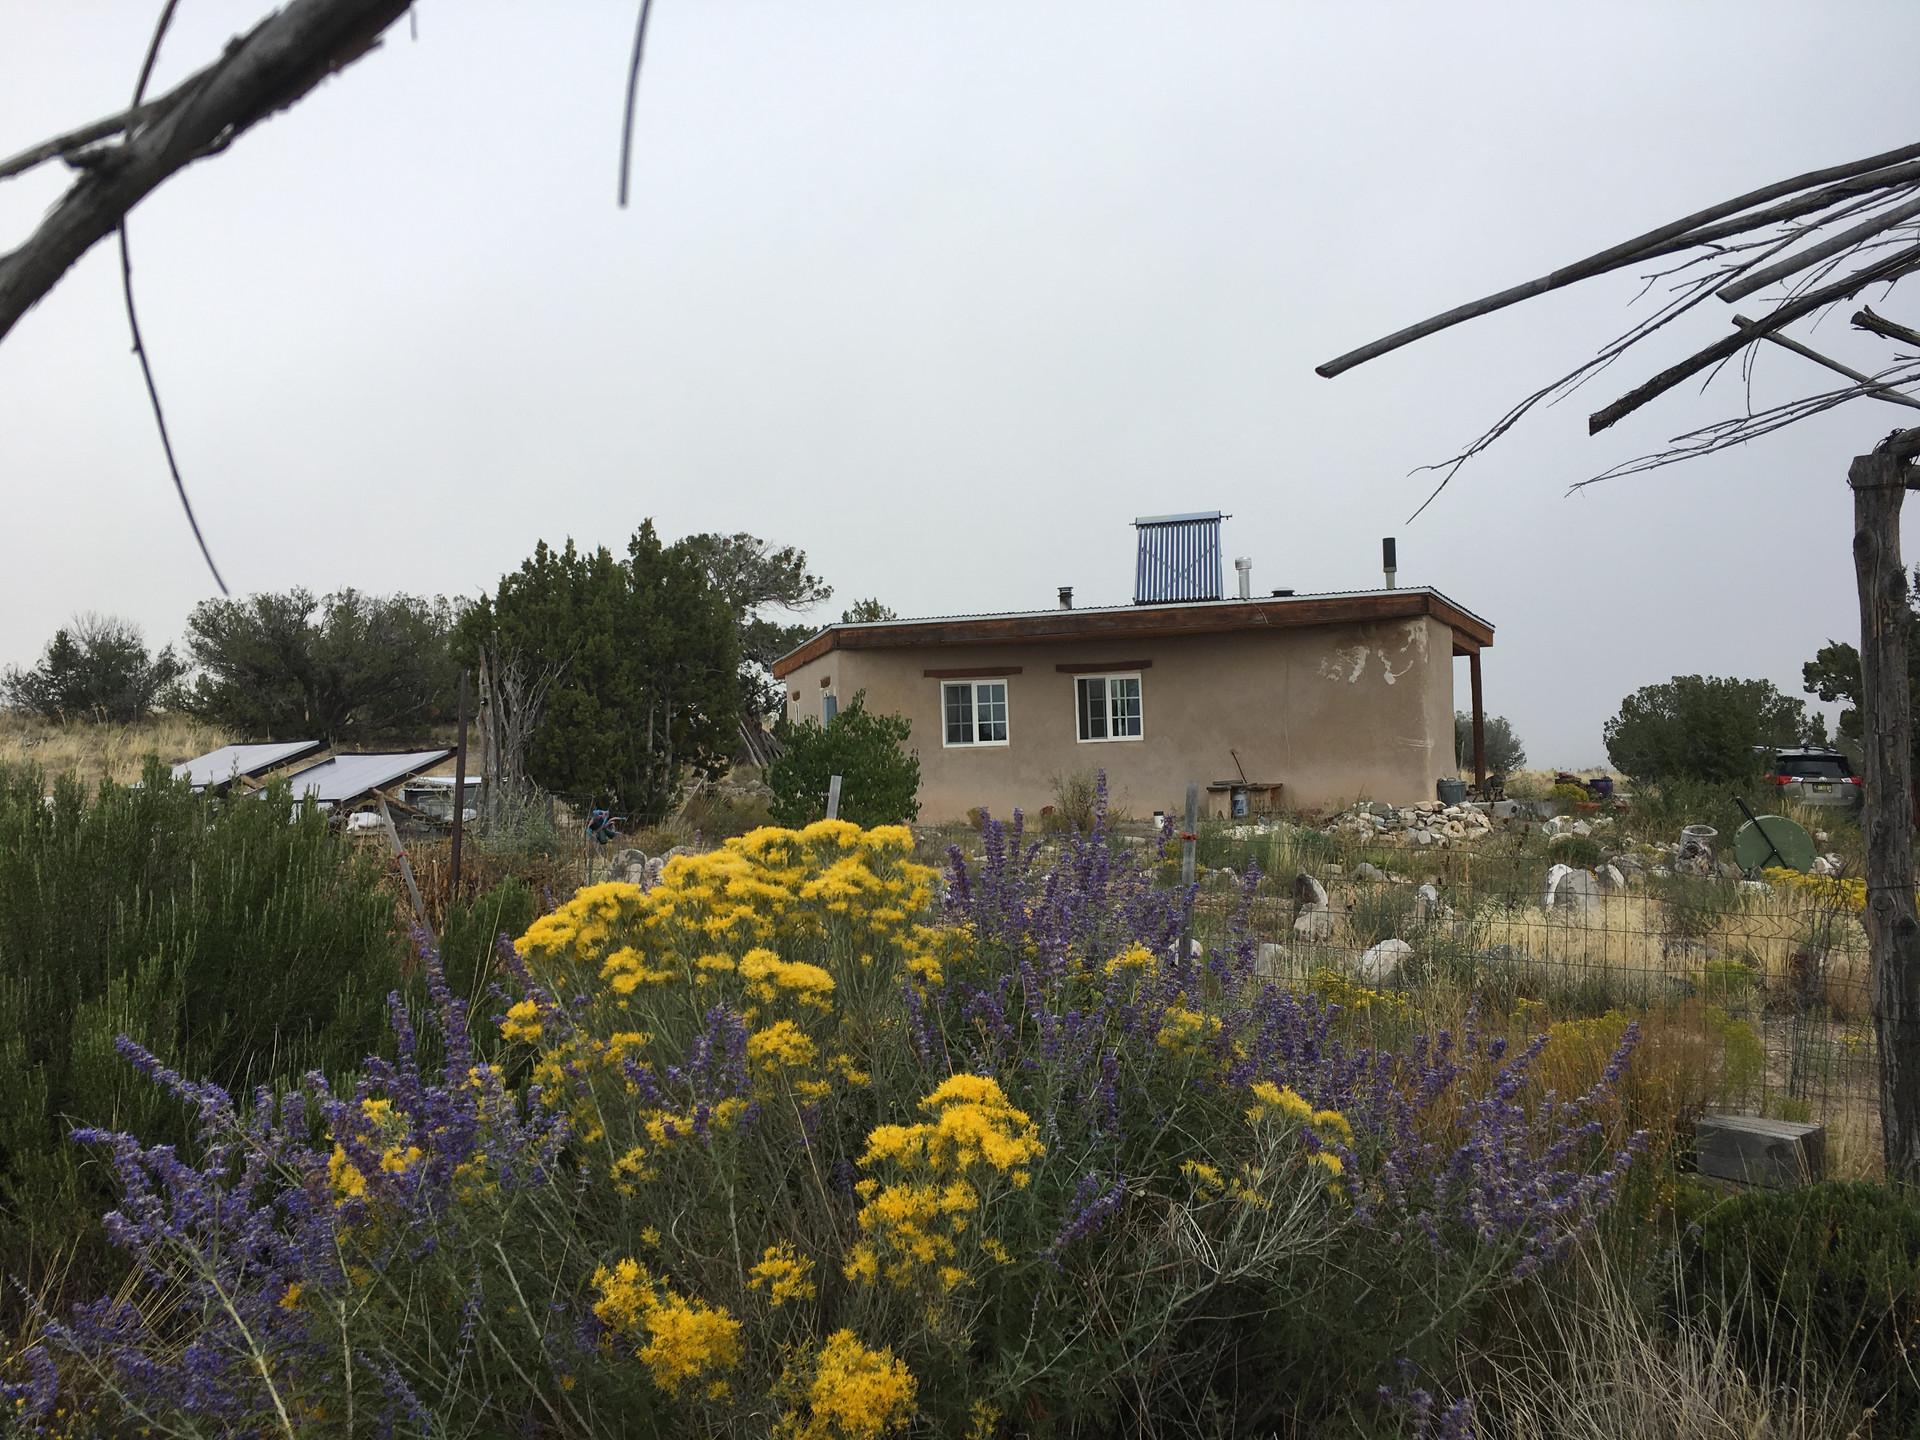 Tano Farm and Littlebird House